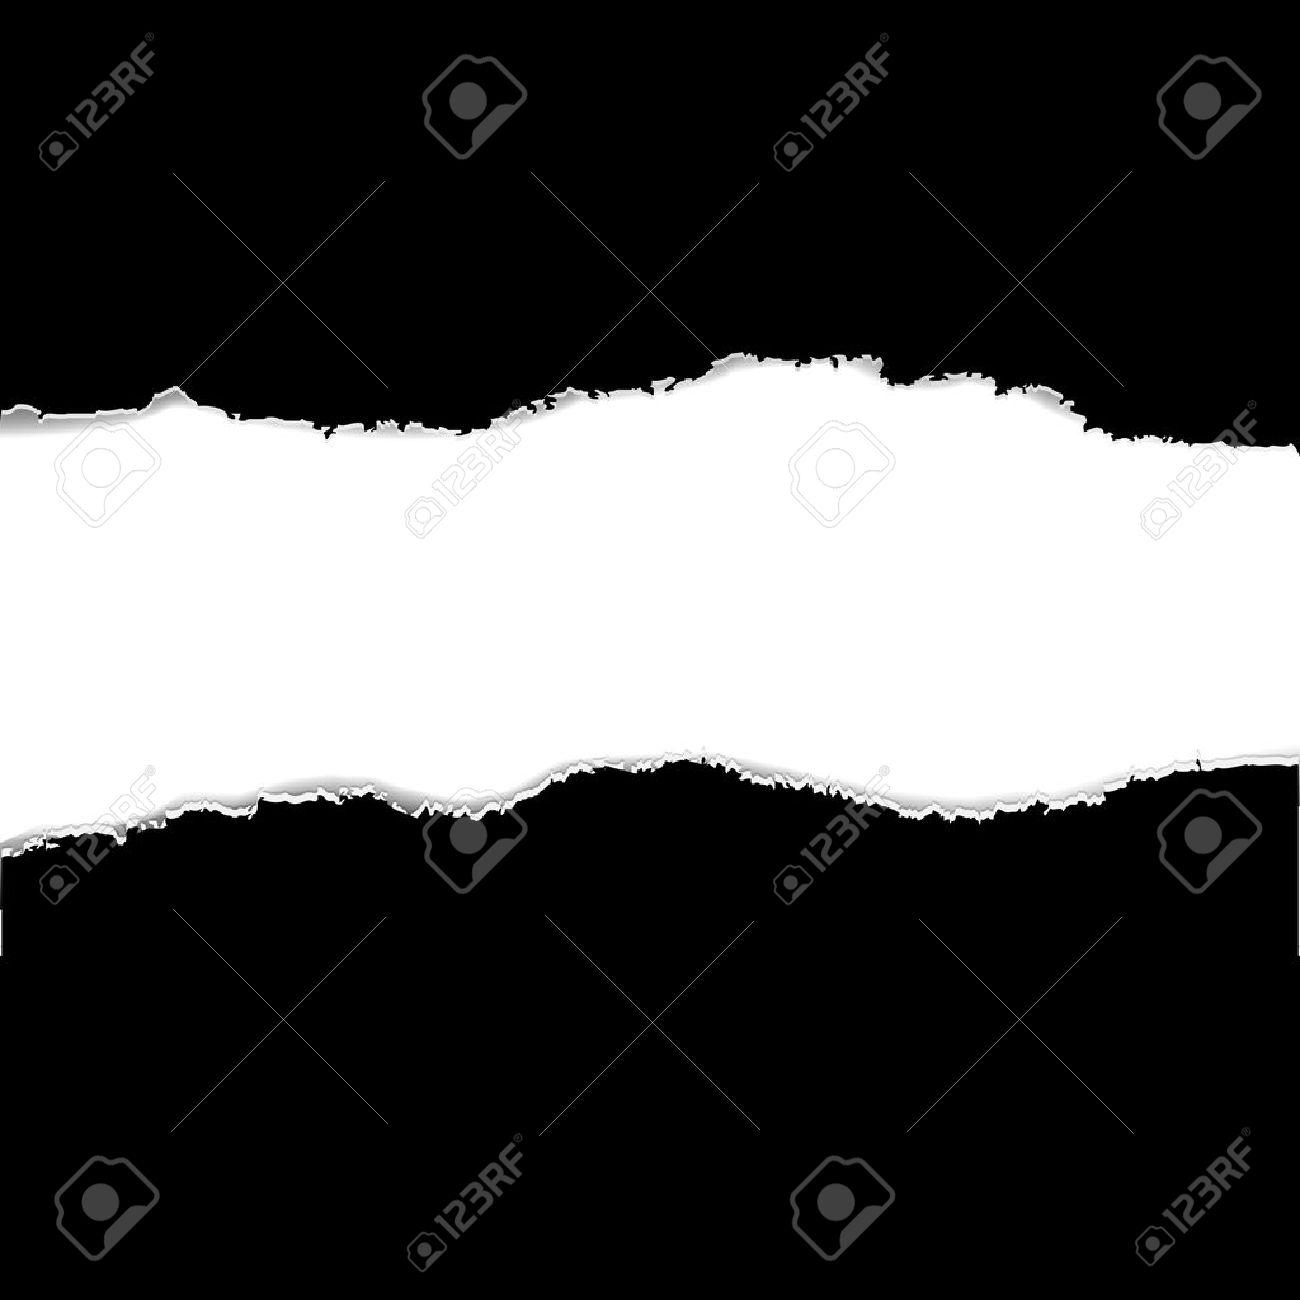 2 Black Torn Paper Borders, Illustration Stock Vector - 15759810